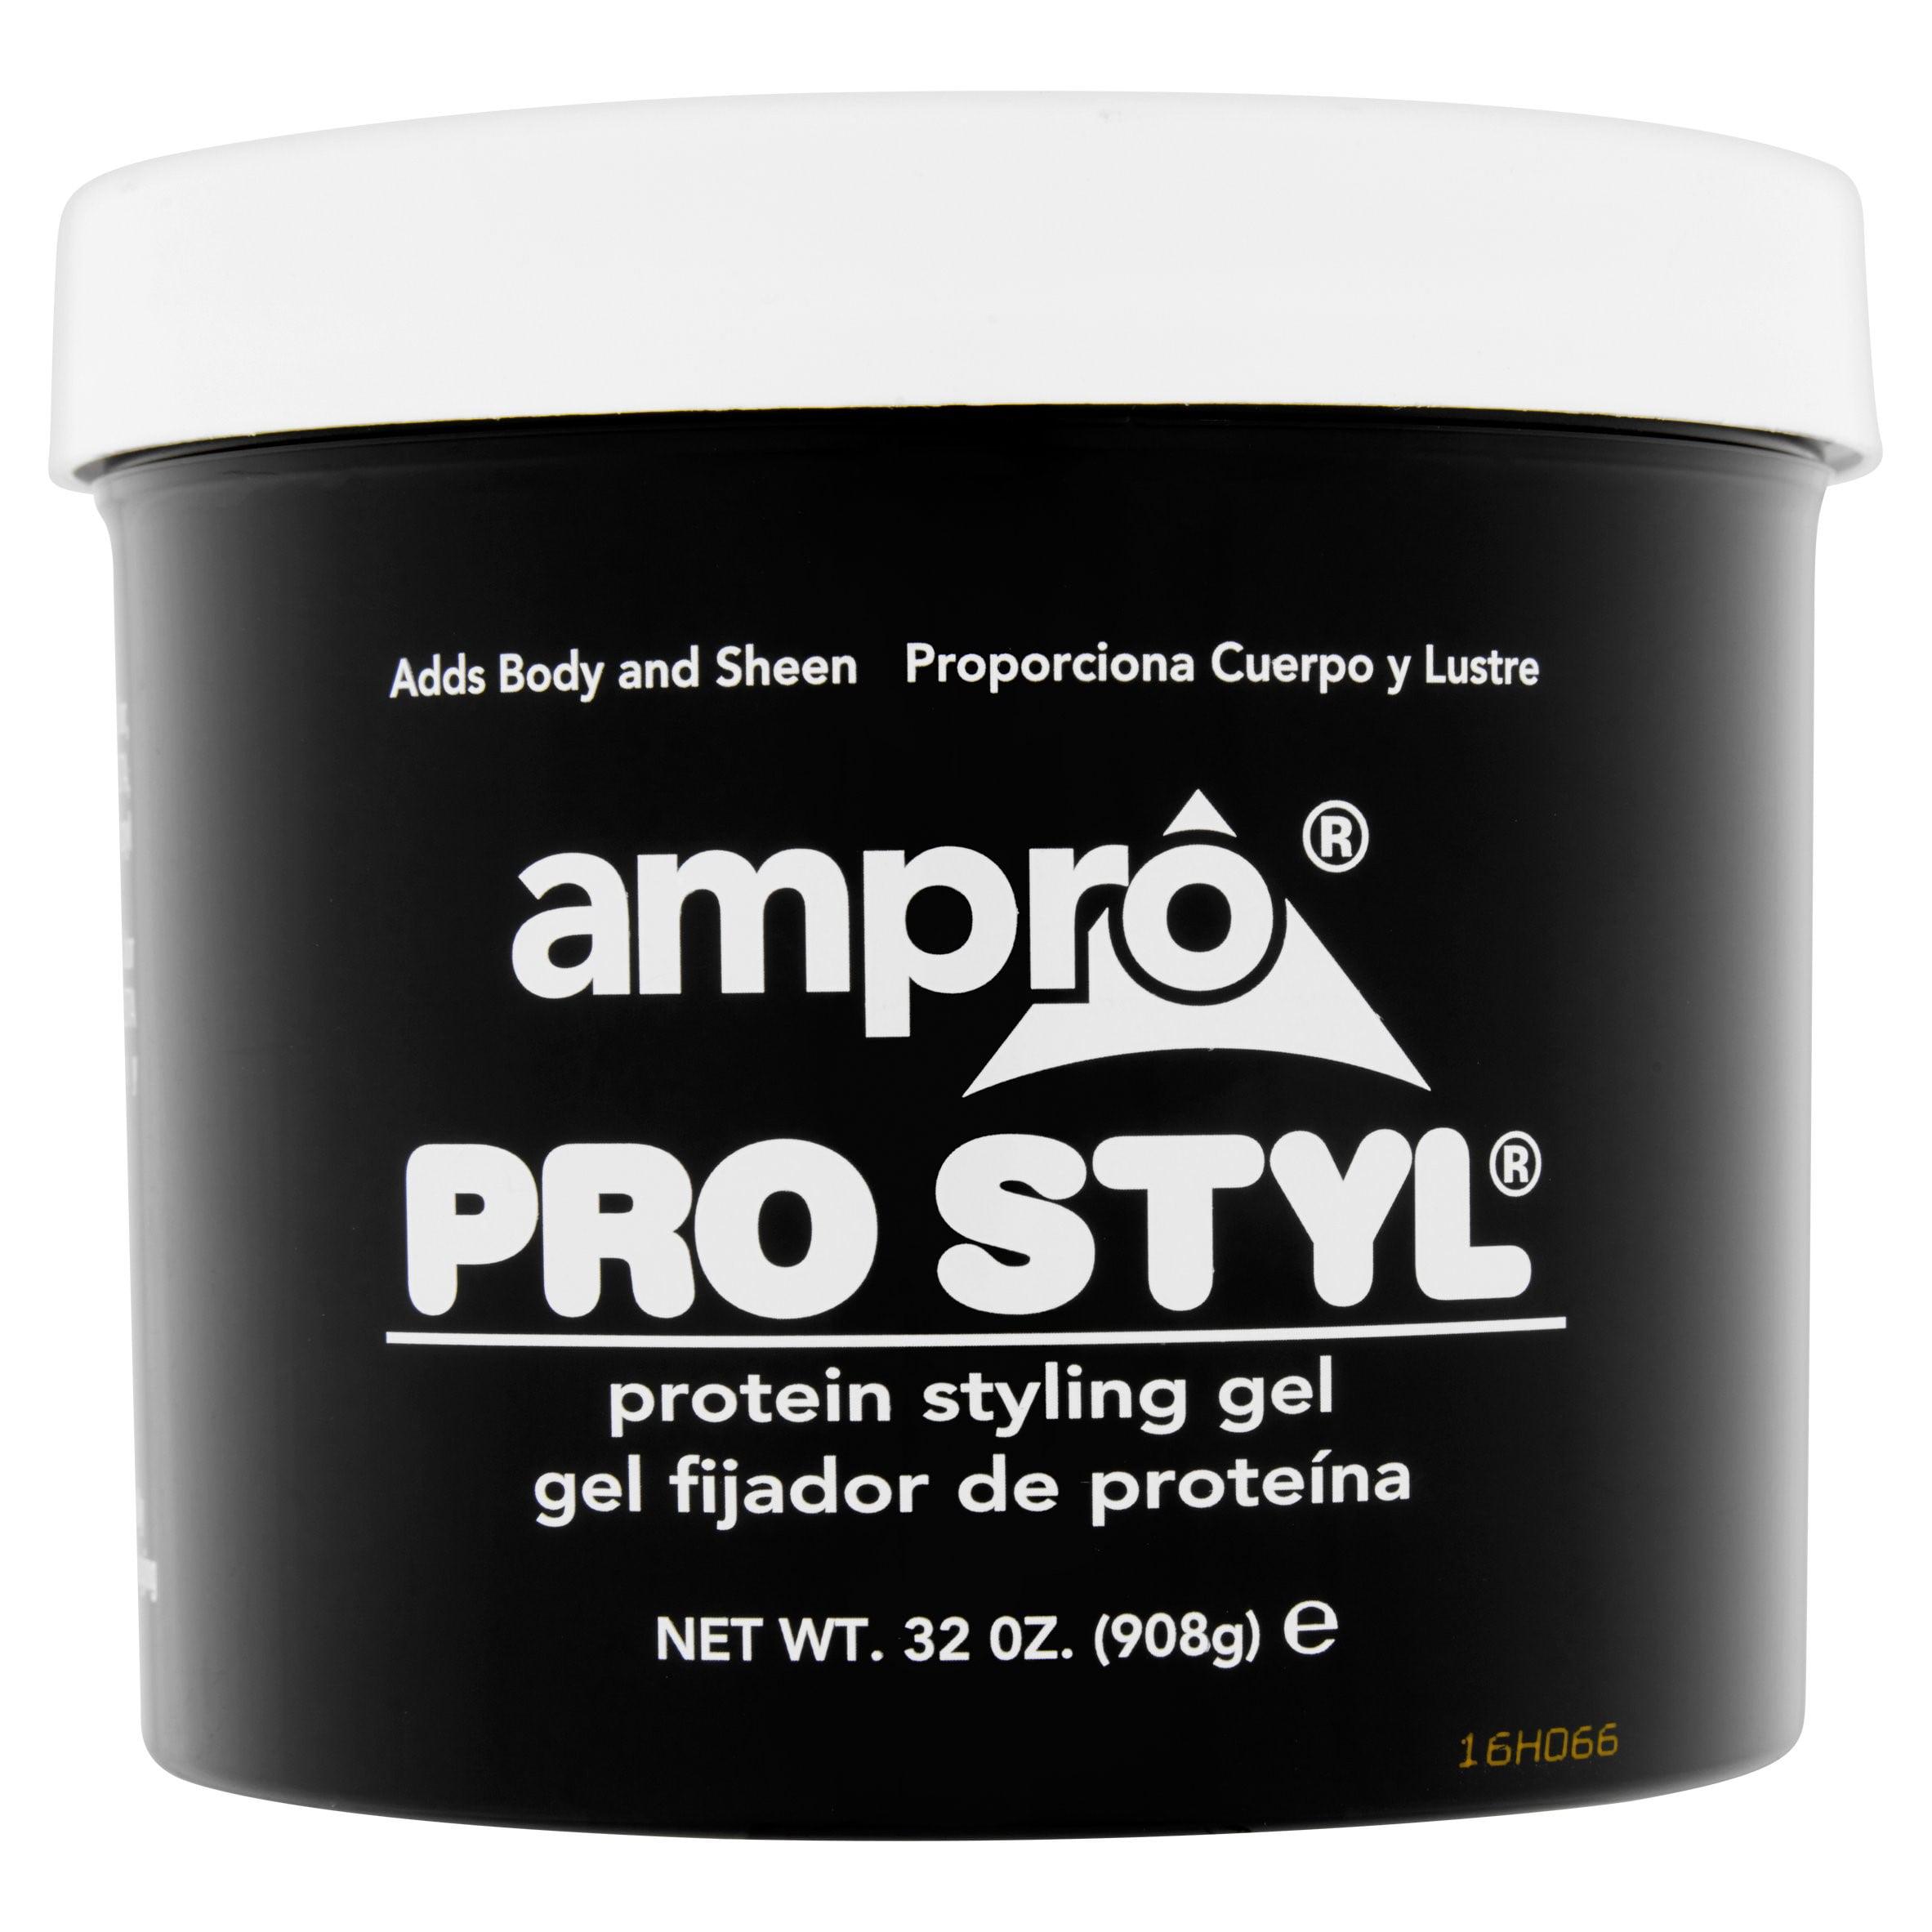 Ampro Pro Styl Protein Styling Gel, 32 oz